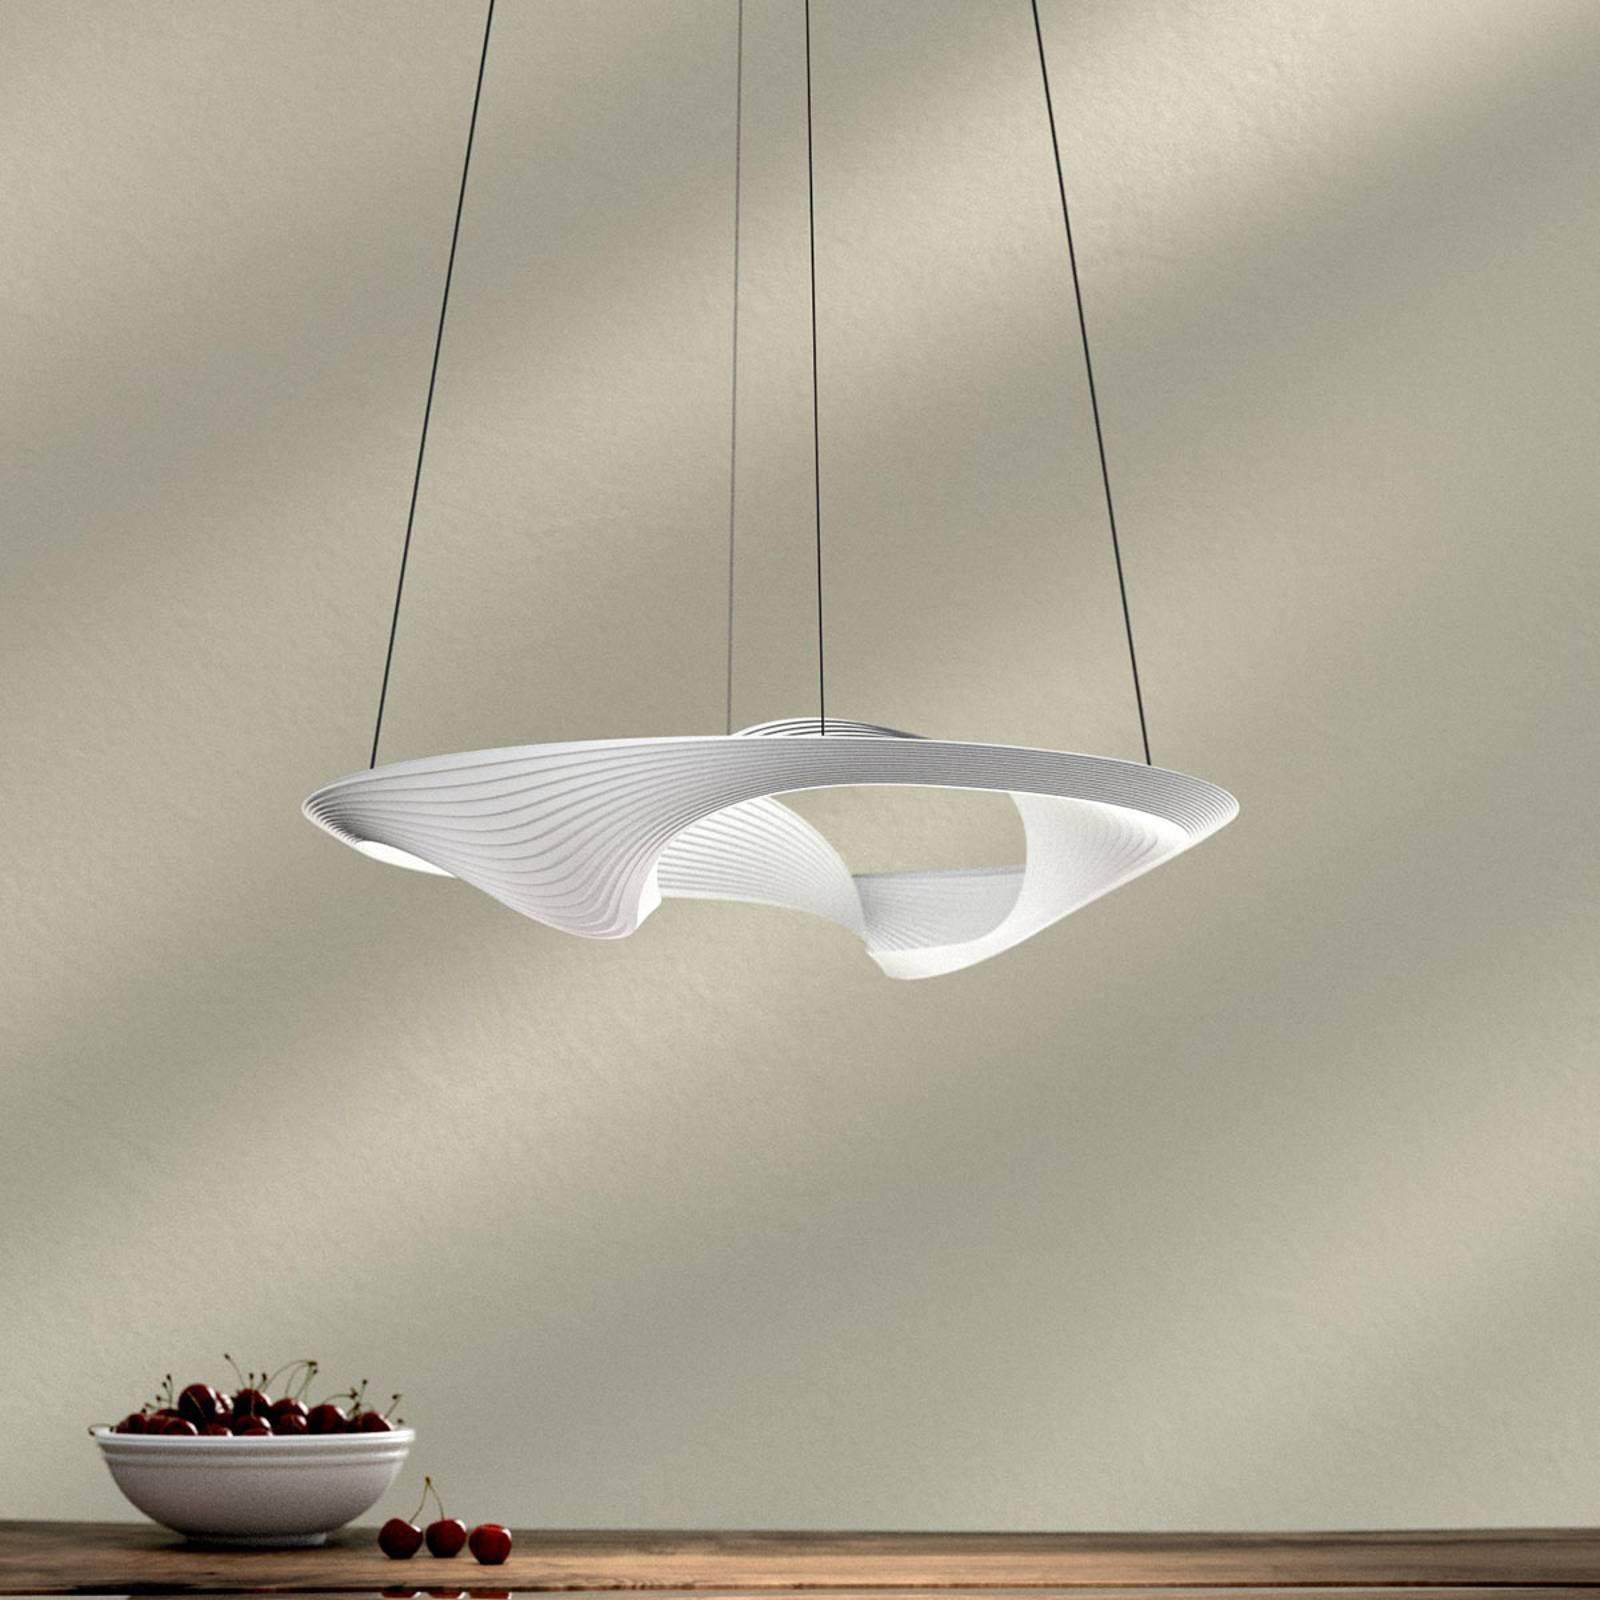 Ściemniana lampa wisząca LED Sestessa Cabrio